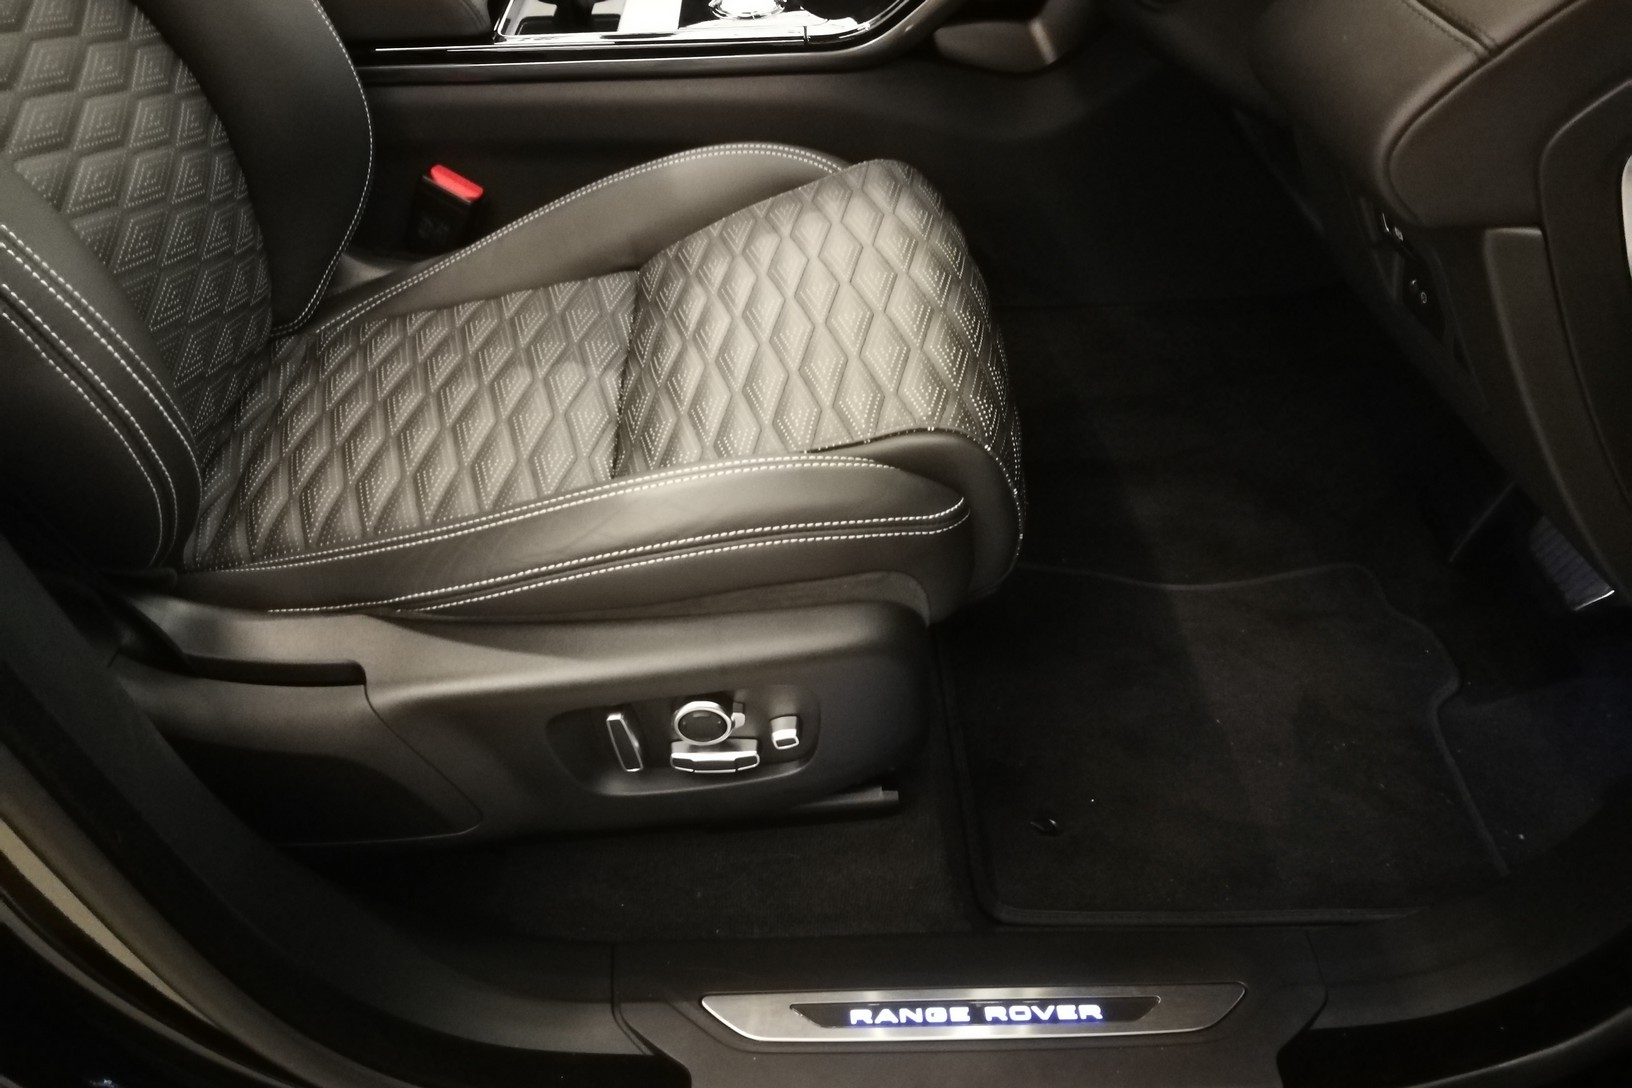 Land Rover Range Rover Velar 5.0 P550 SVAutobiography Dynamic Edition image 17